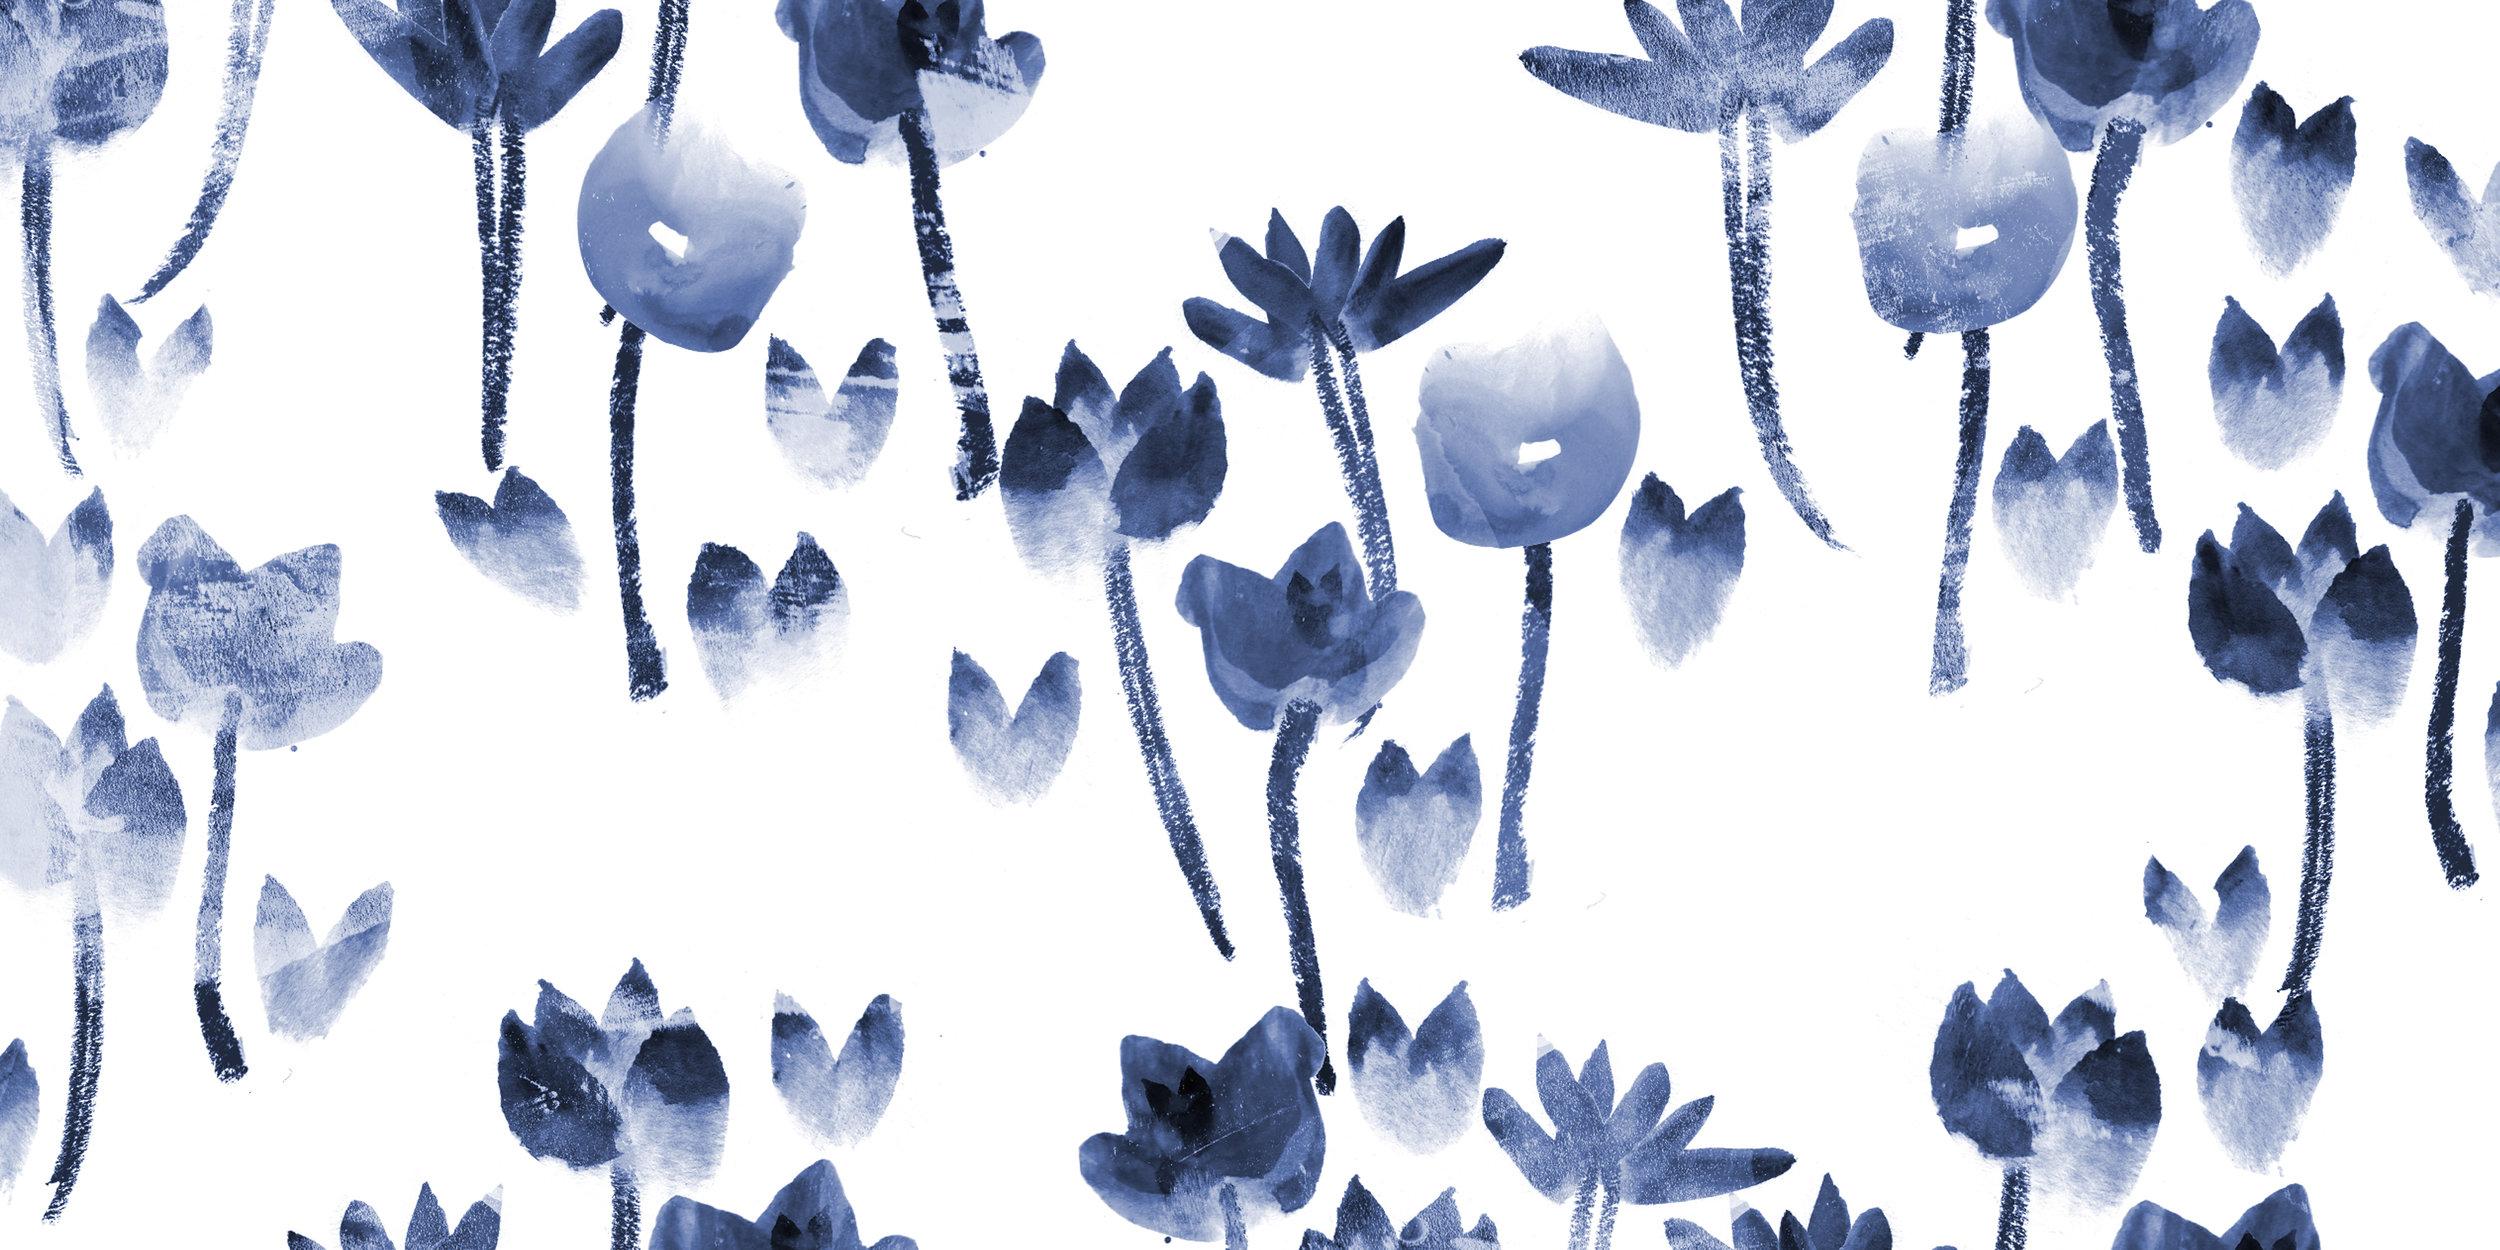 PatternsForWebsite_Wide_BlueFlowers.jpg